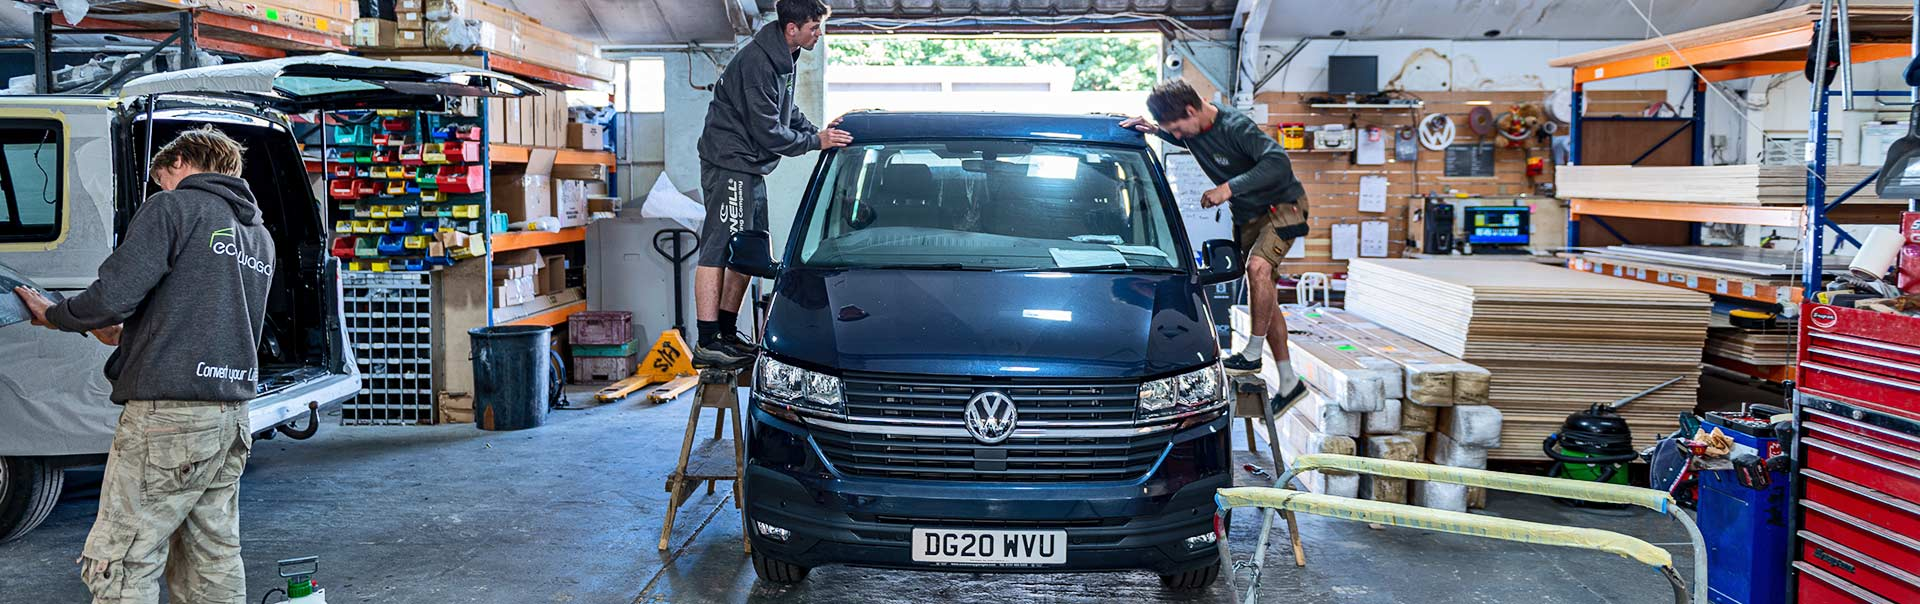 Ecowagon VW Conversion Workshop